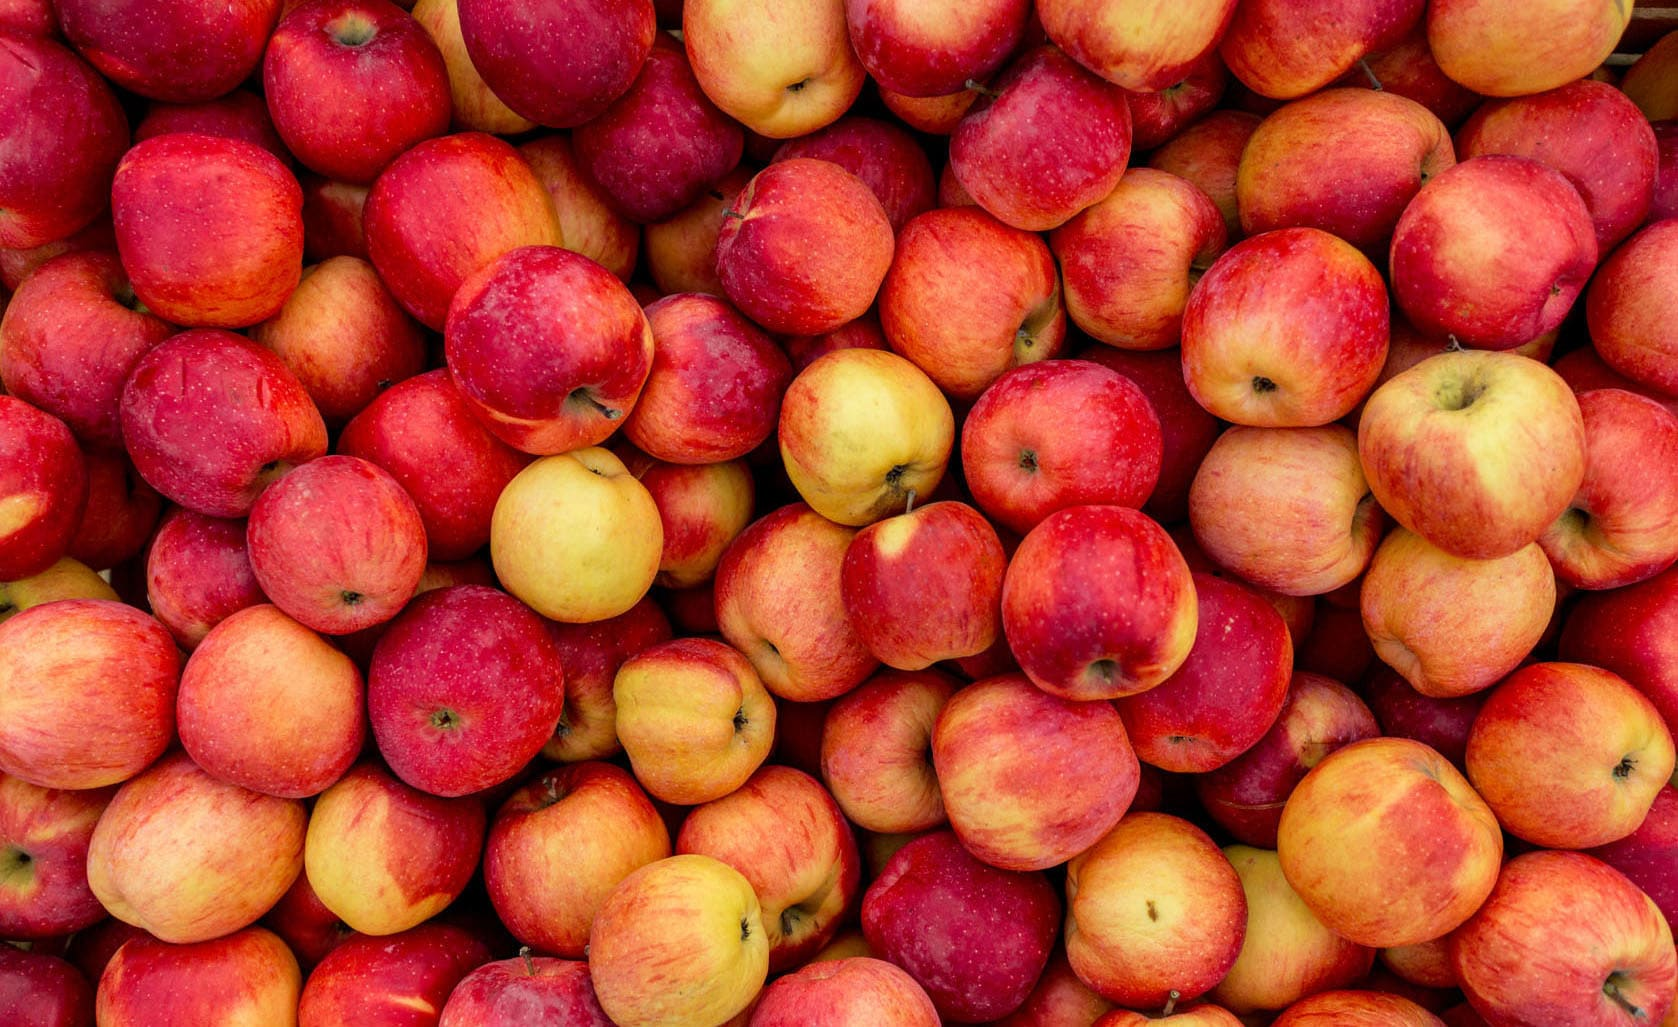 Äpfel essen trotz Apfelallergie